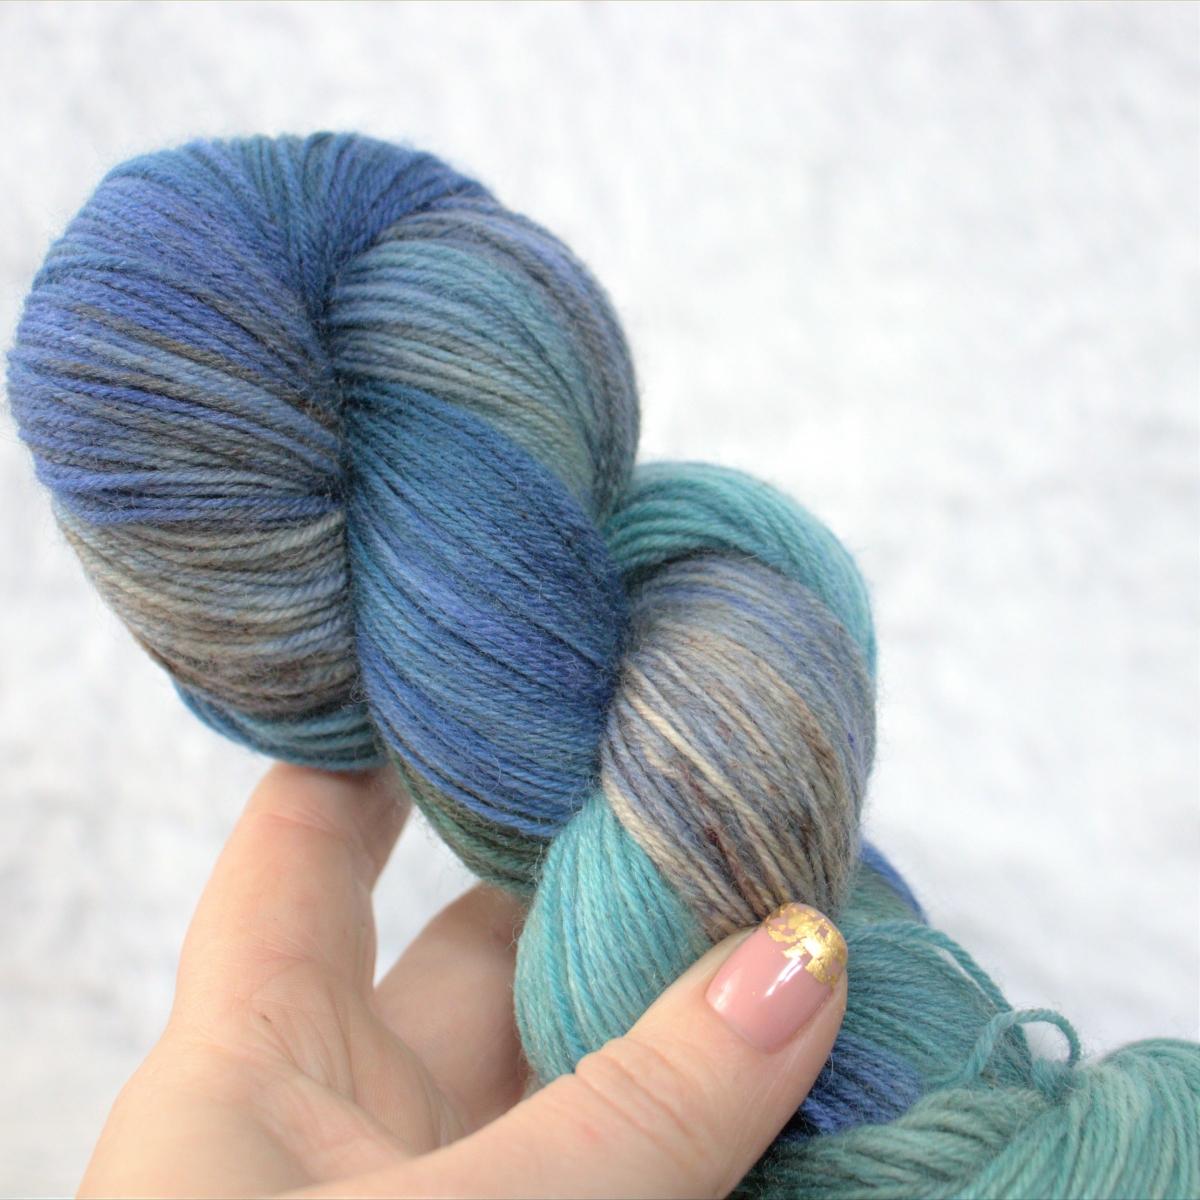 woodico.pro hand dyed yarn 052 1 1200x1200 - Hand dyed yarn / 052